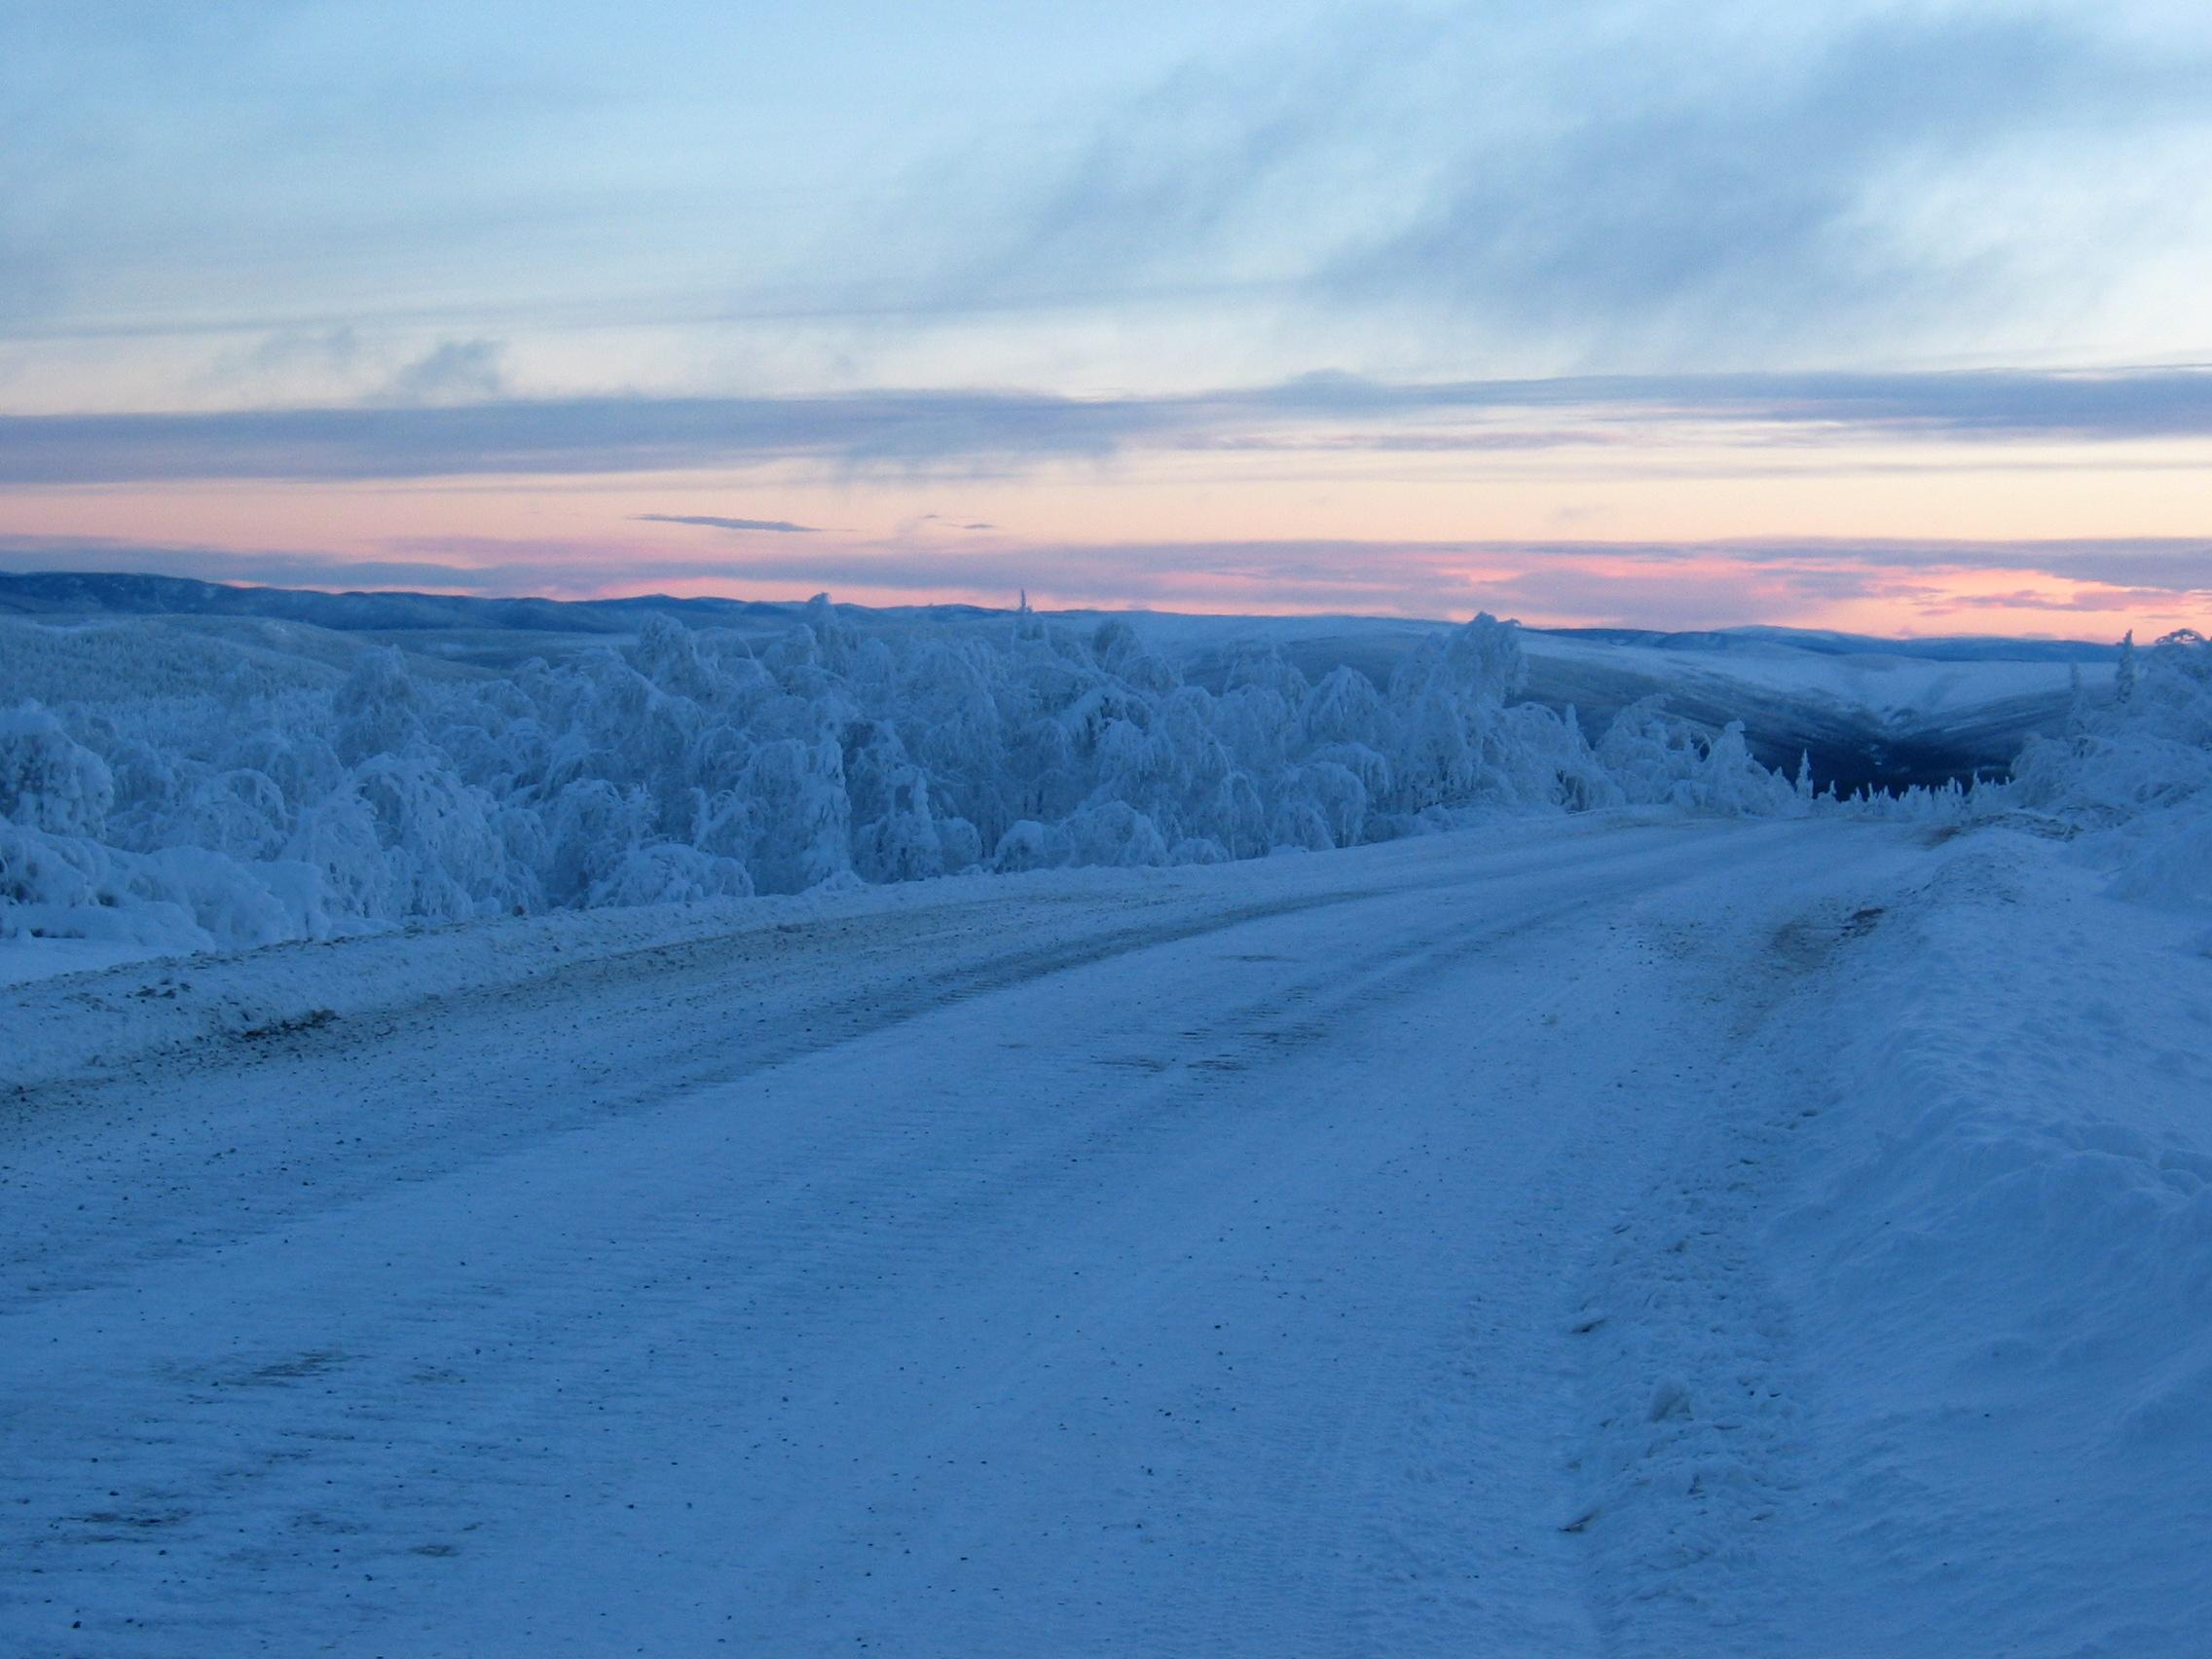 Aurora Drive - Mile 9 - 31 Dec 05 - 008.jpg